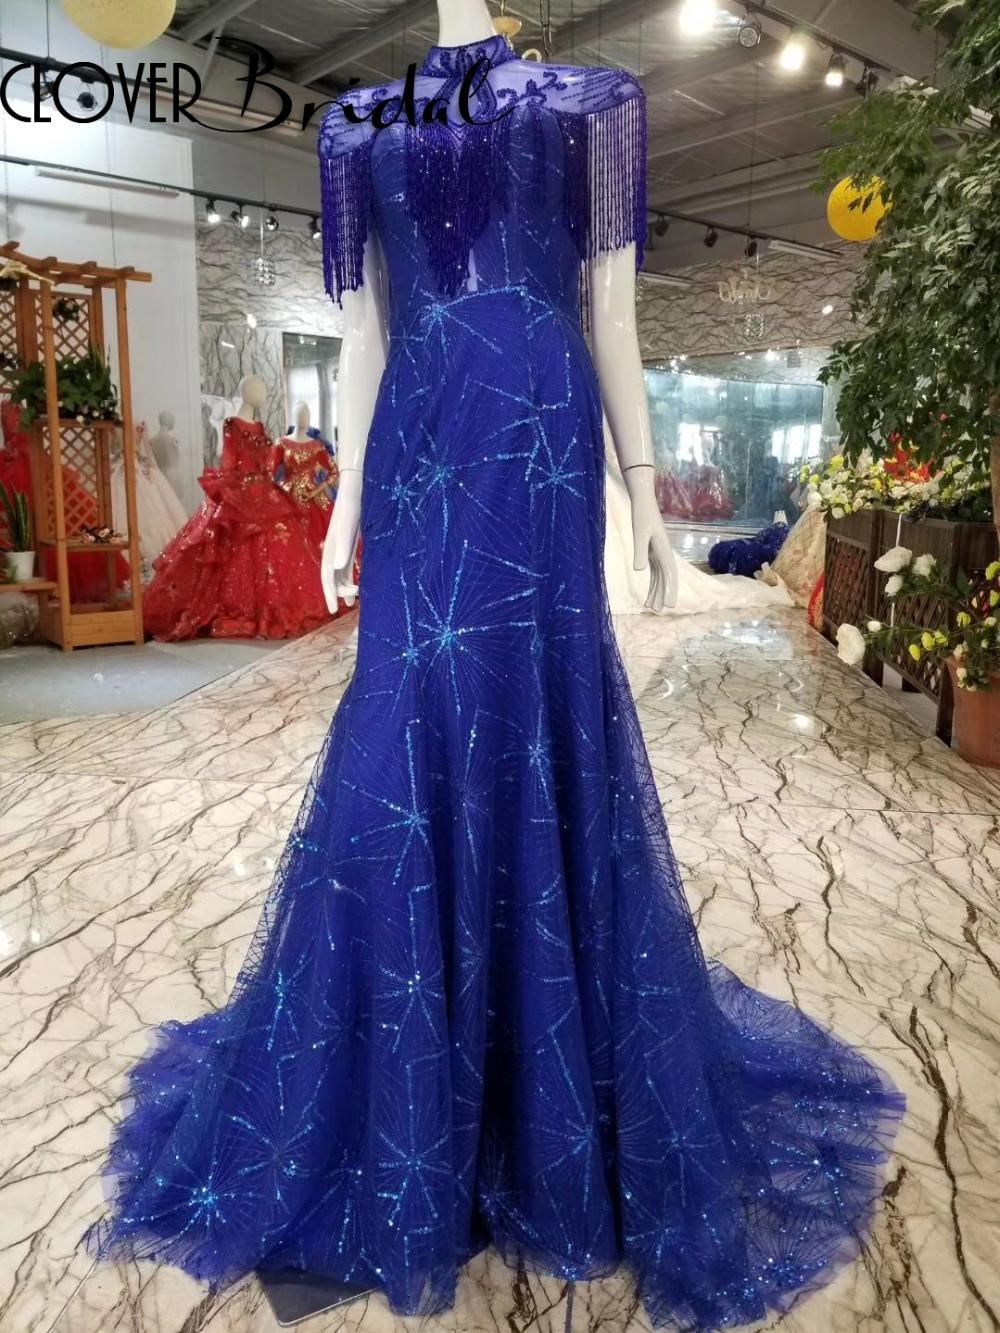 CloverBridal Fireworks patterns glitter beaded new long royal blue mermaid tassels   prom     dresses   2019 vestido de formatura longo